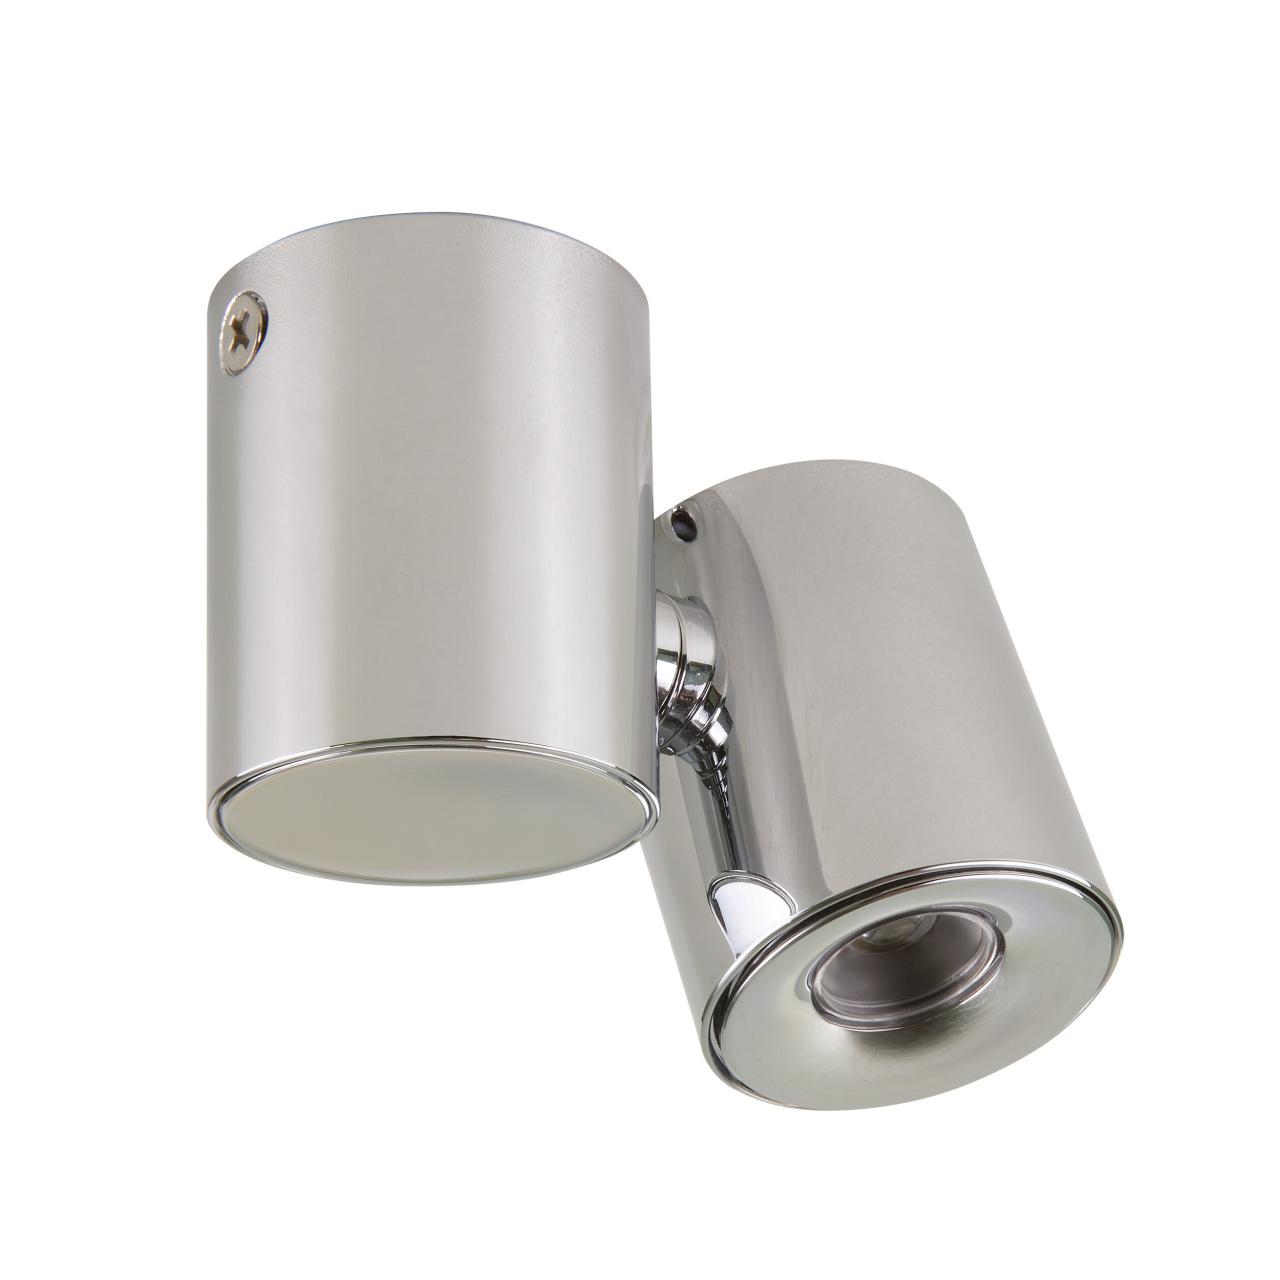 Светильник Punto LED 3W 190LM 20G хром 4000K IP40 Lightstar 051124